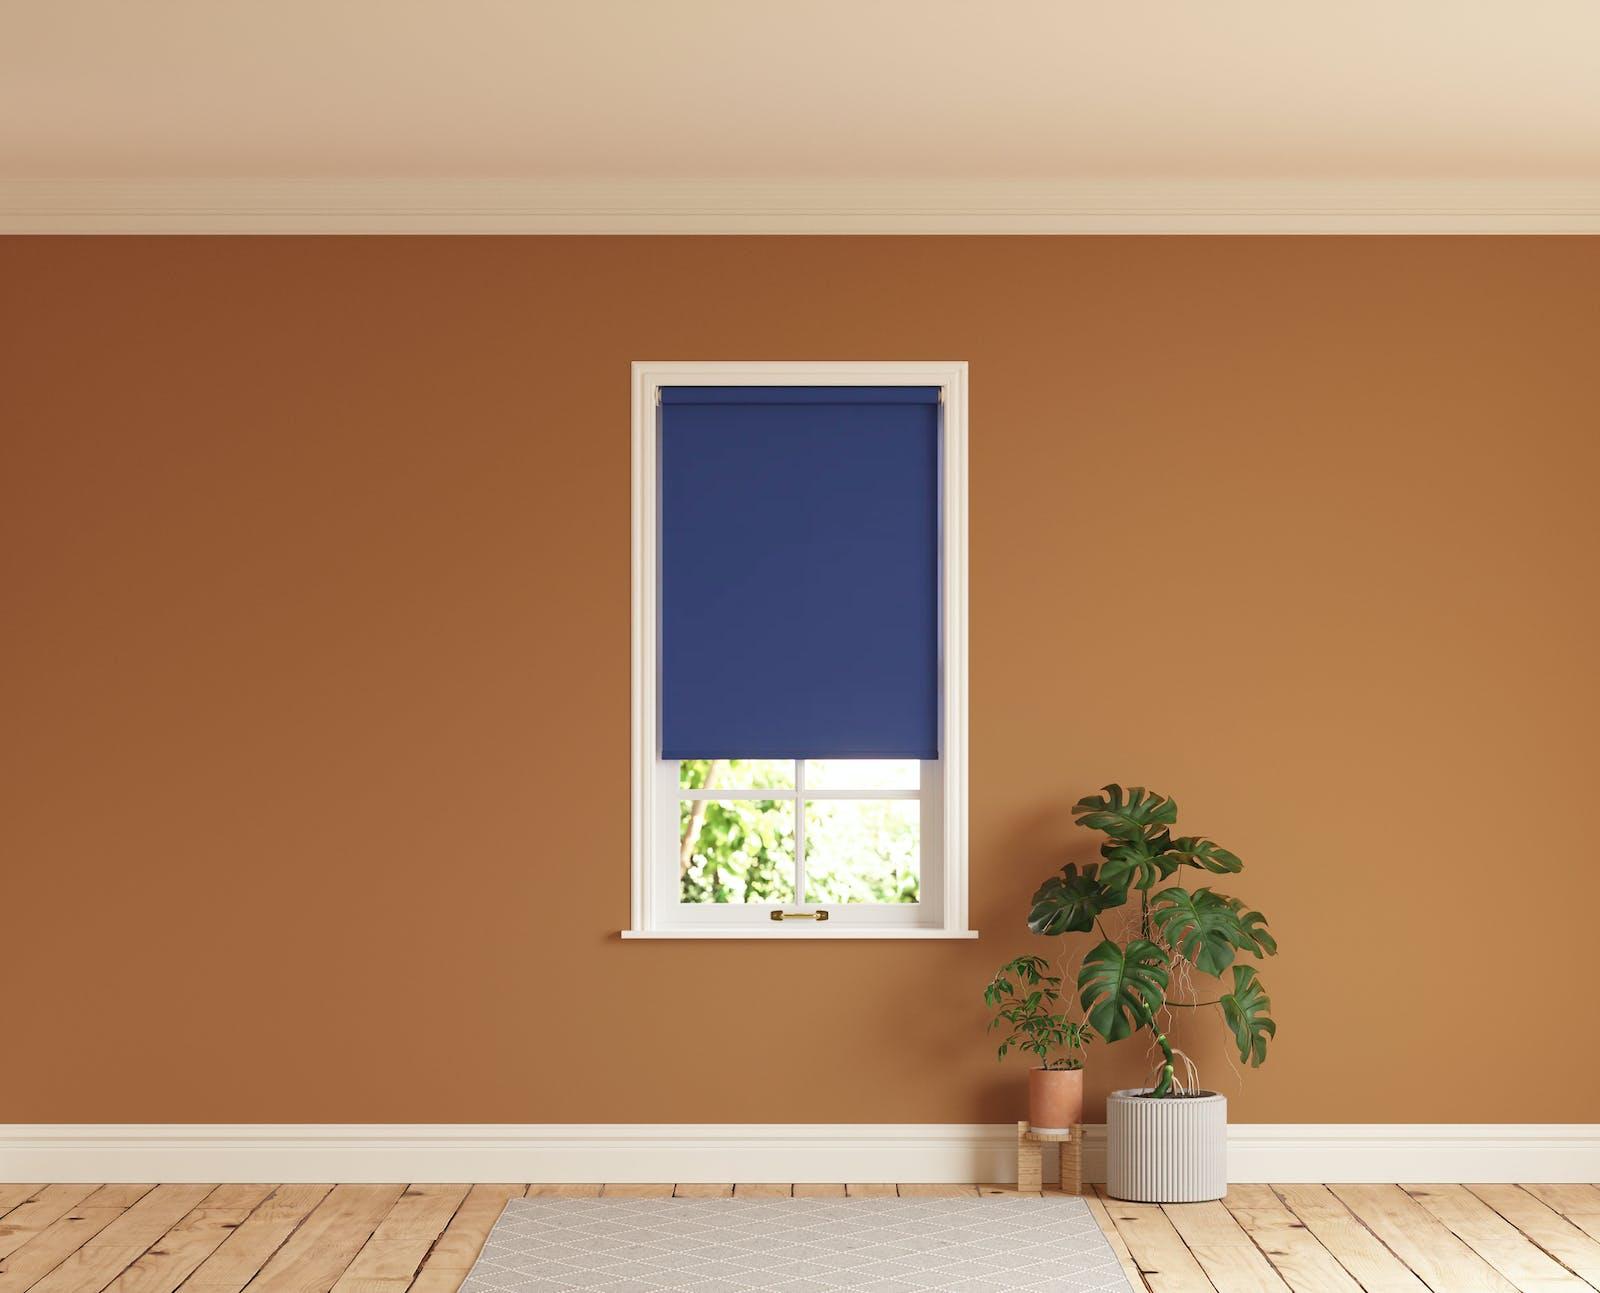 Lick Blue 08 roller blinds against an Orange 02 wall